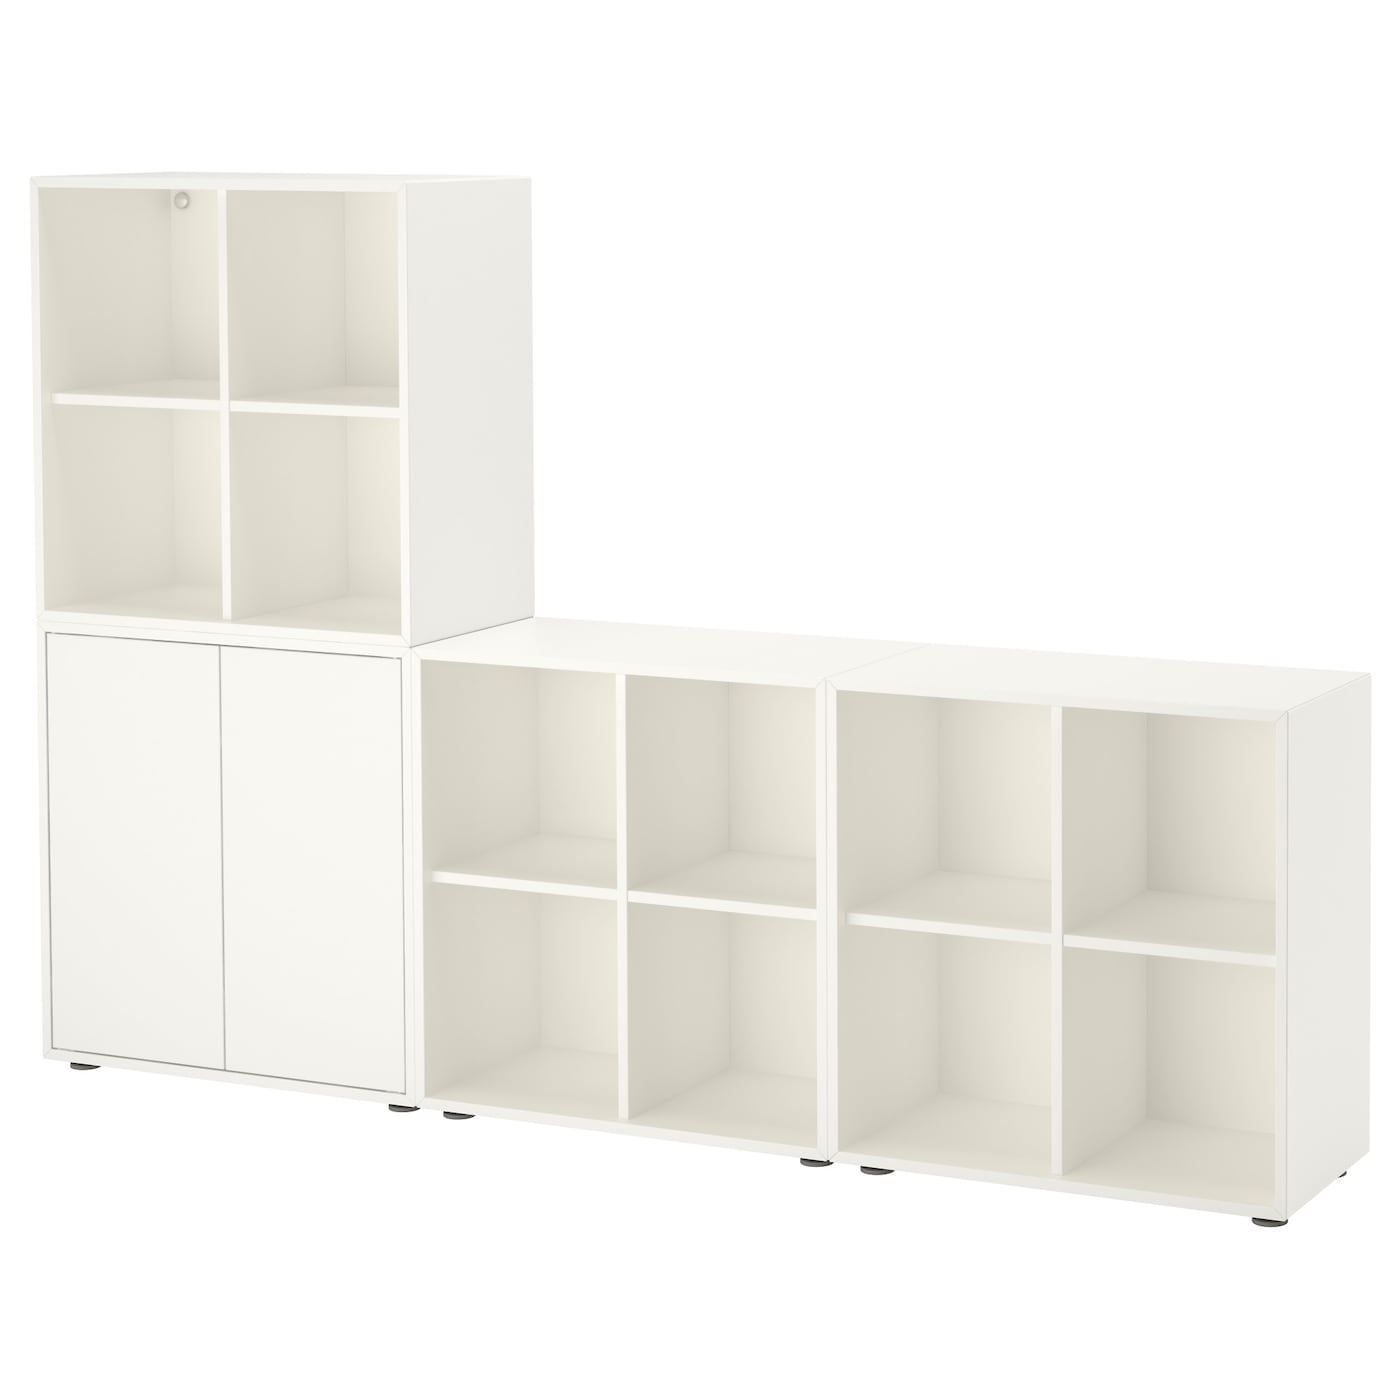 Eket Cabinet Combination With Feet White 210x35x142 Cm Ikea